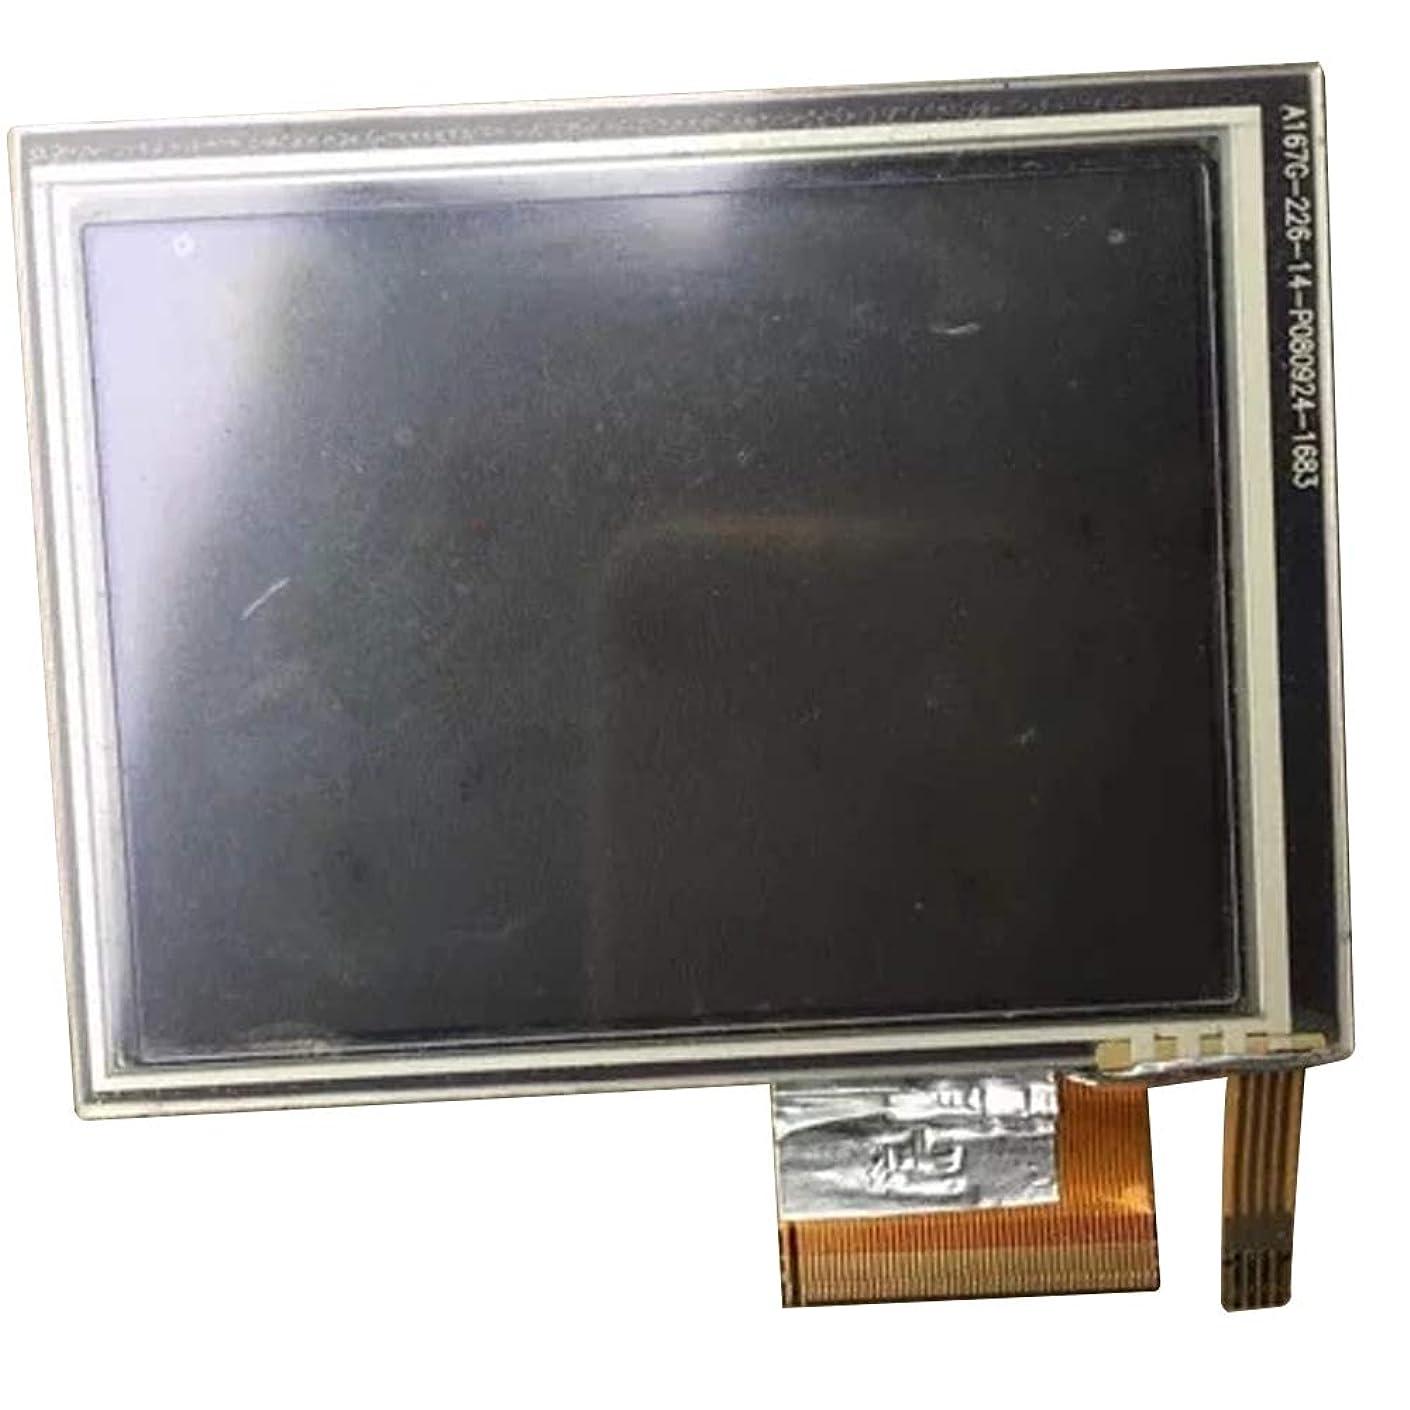 L&W 3.5 inch LCD Display Screen for Navigation Model Name LQ035Q7DH06 by L&W LCD